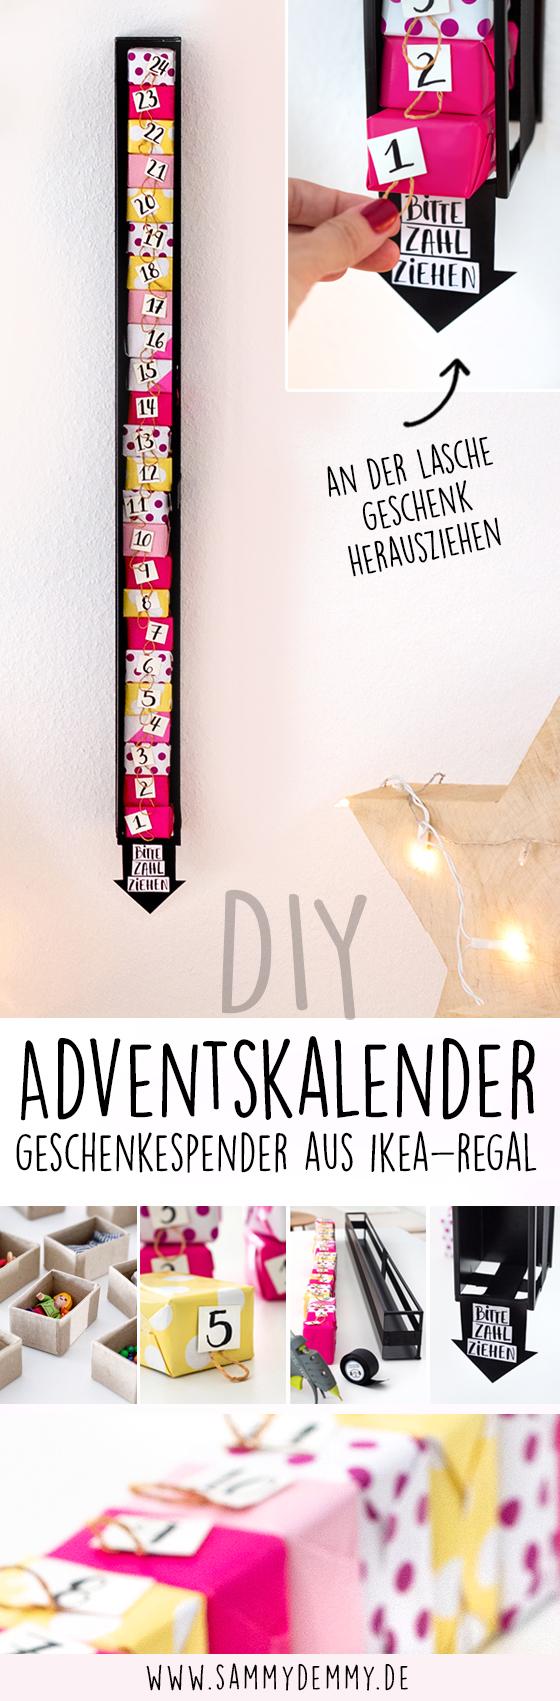 DIY Adventskalender Anleitung